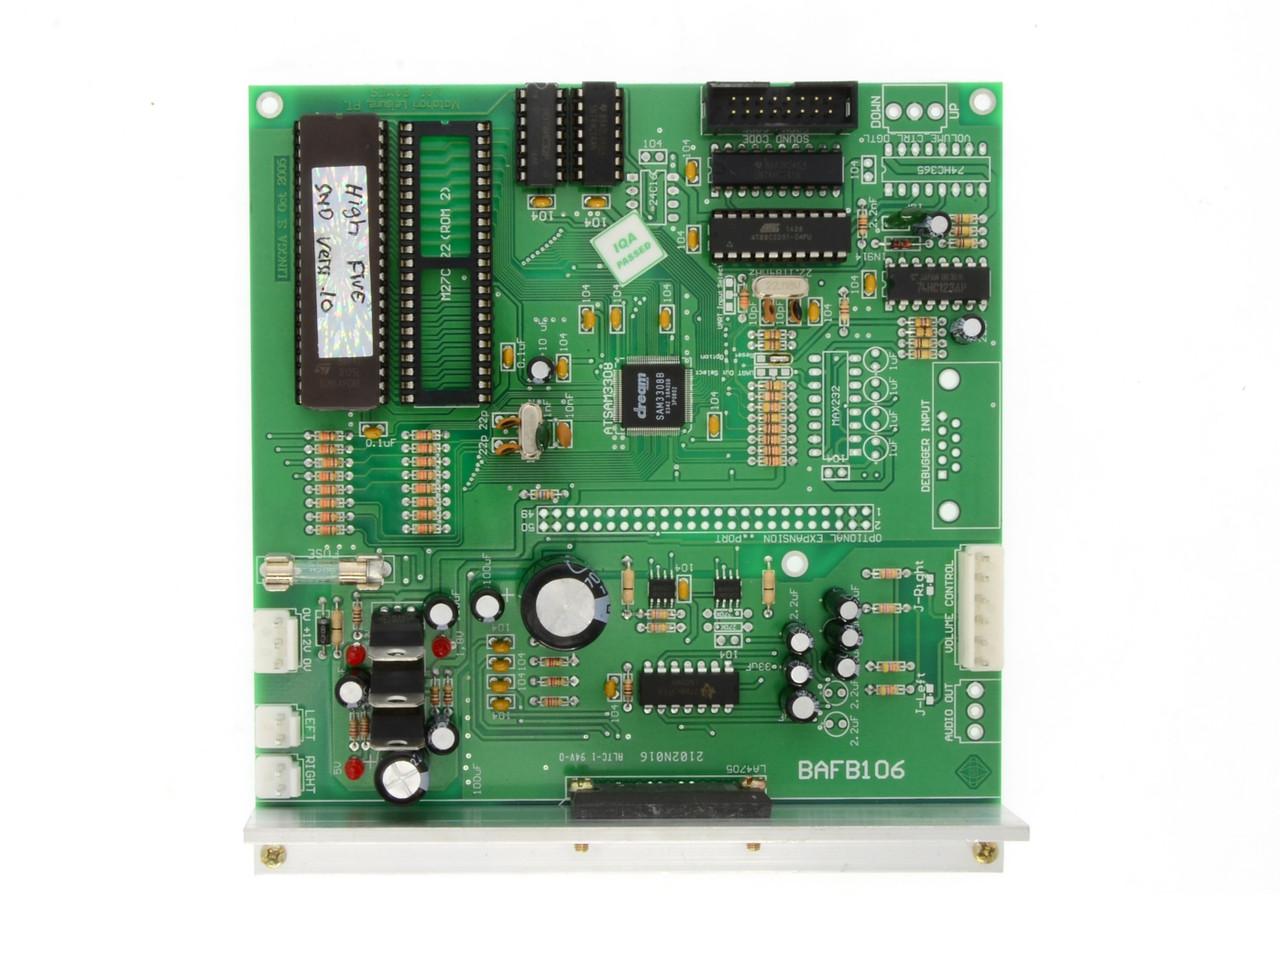 Sound Board for High Five (BAFB106-HF1)